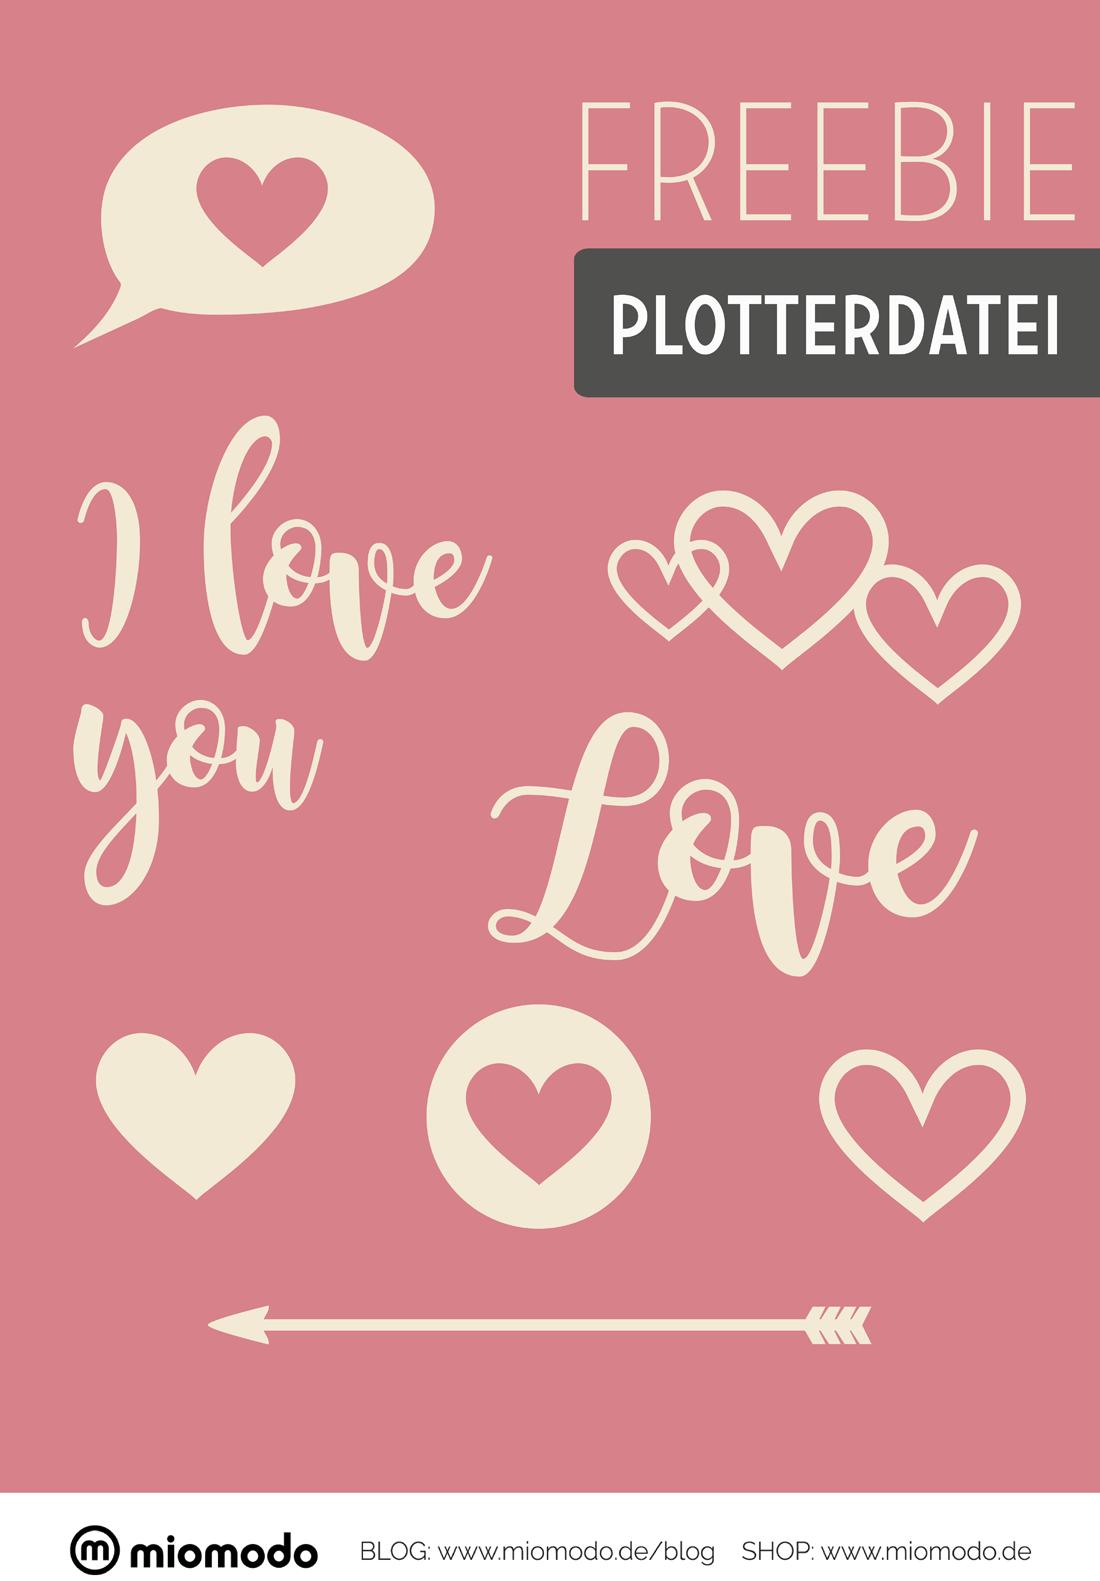 Valentinstag DIY Freebie Plotterdatei | Plotter | Pinterest ...